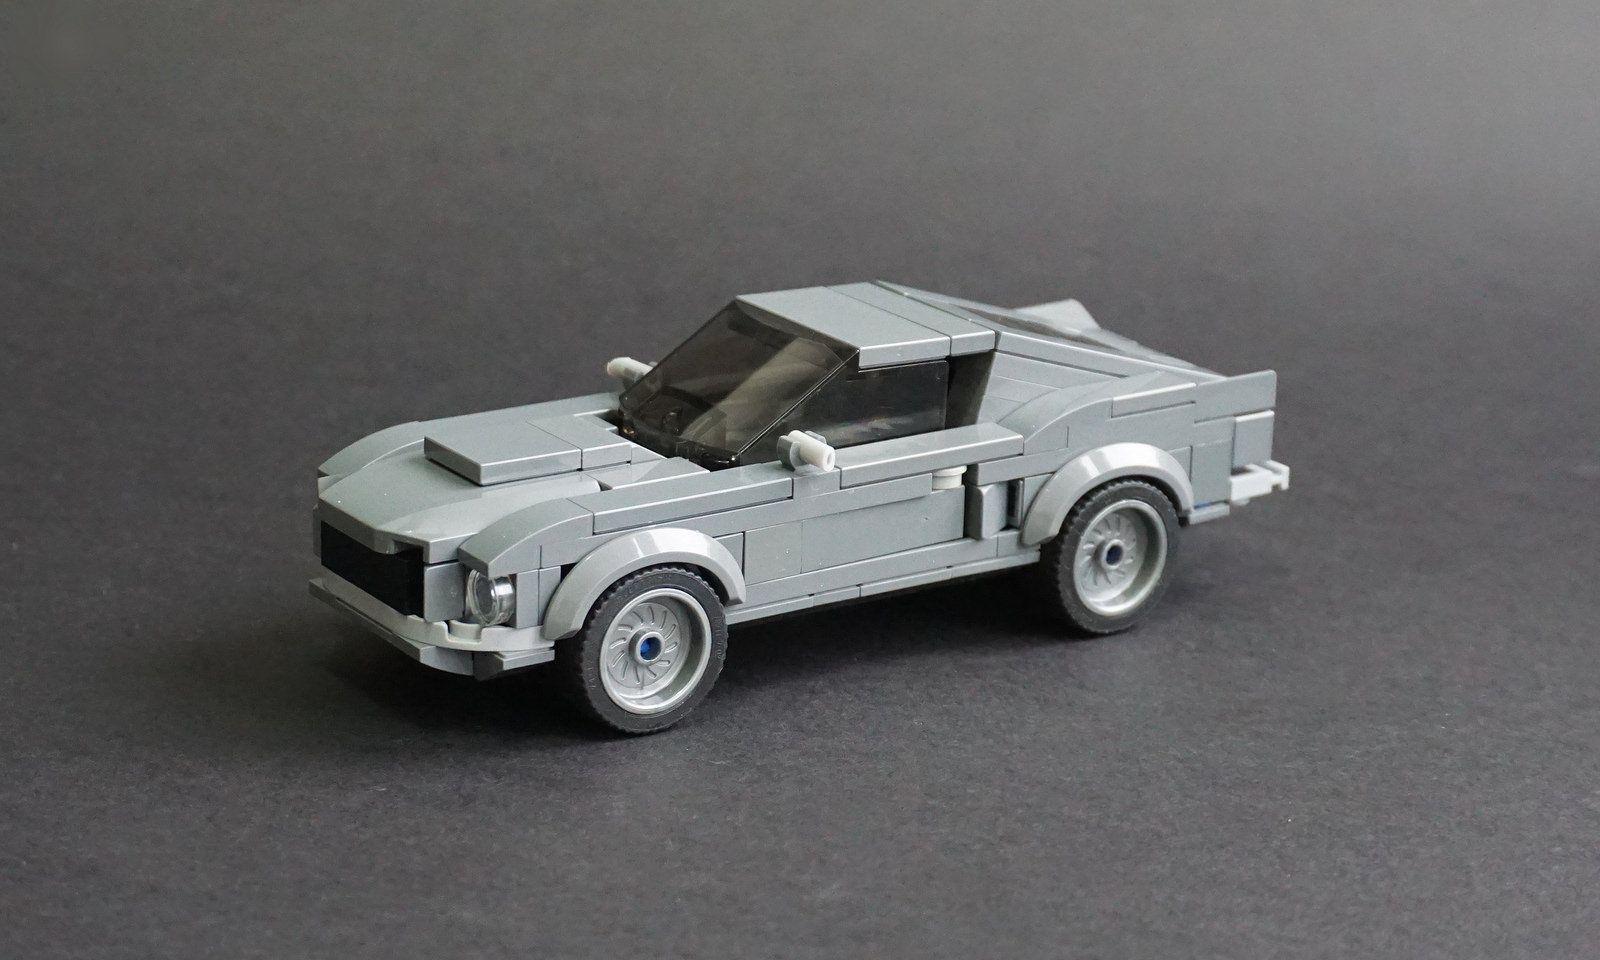 Lego 1968 ford mustang fastback 01 by jonathan ẹlliott